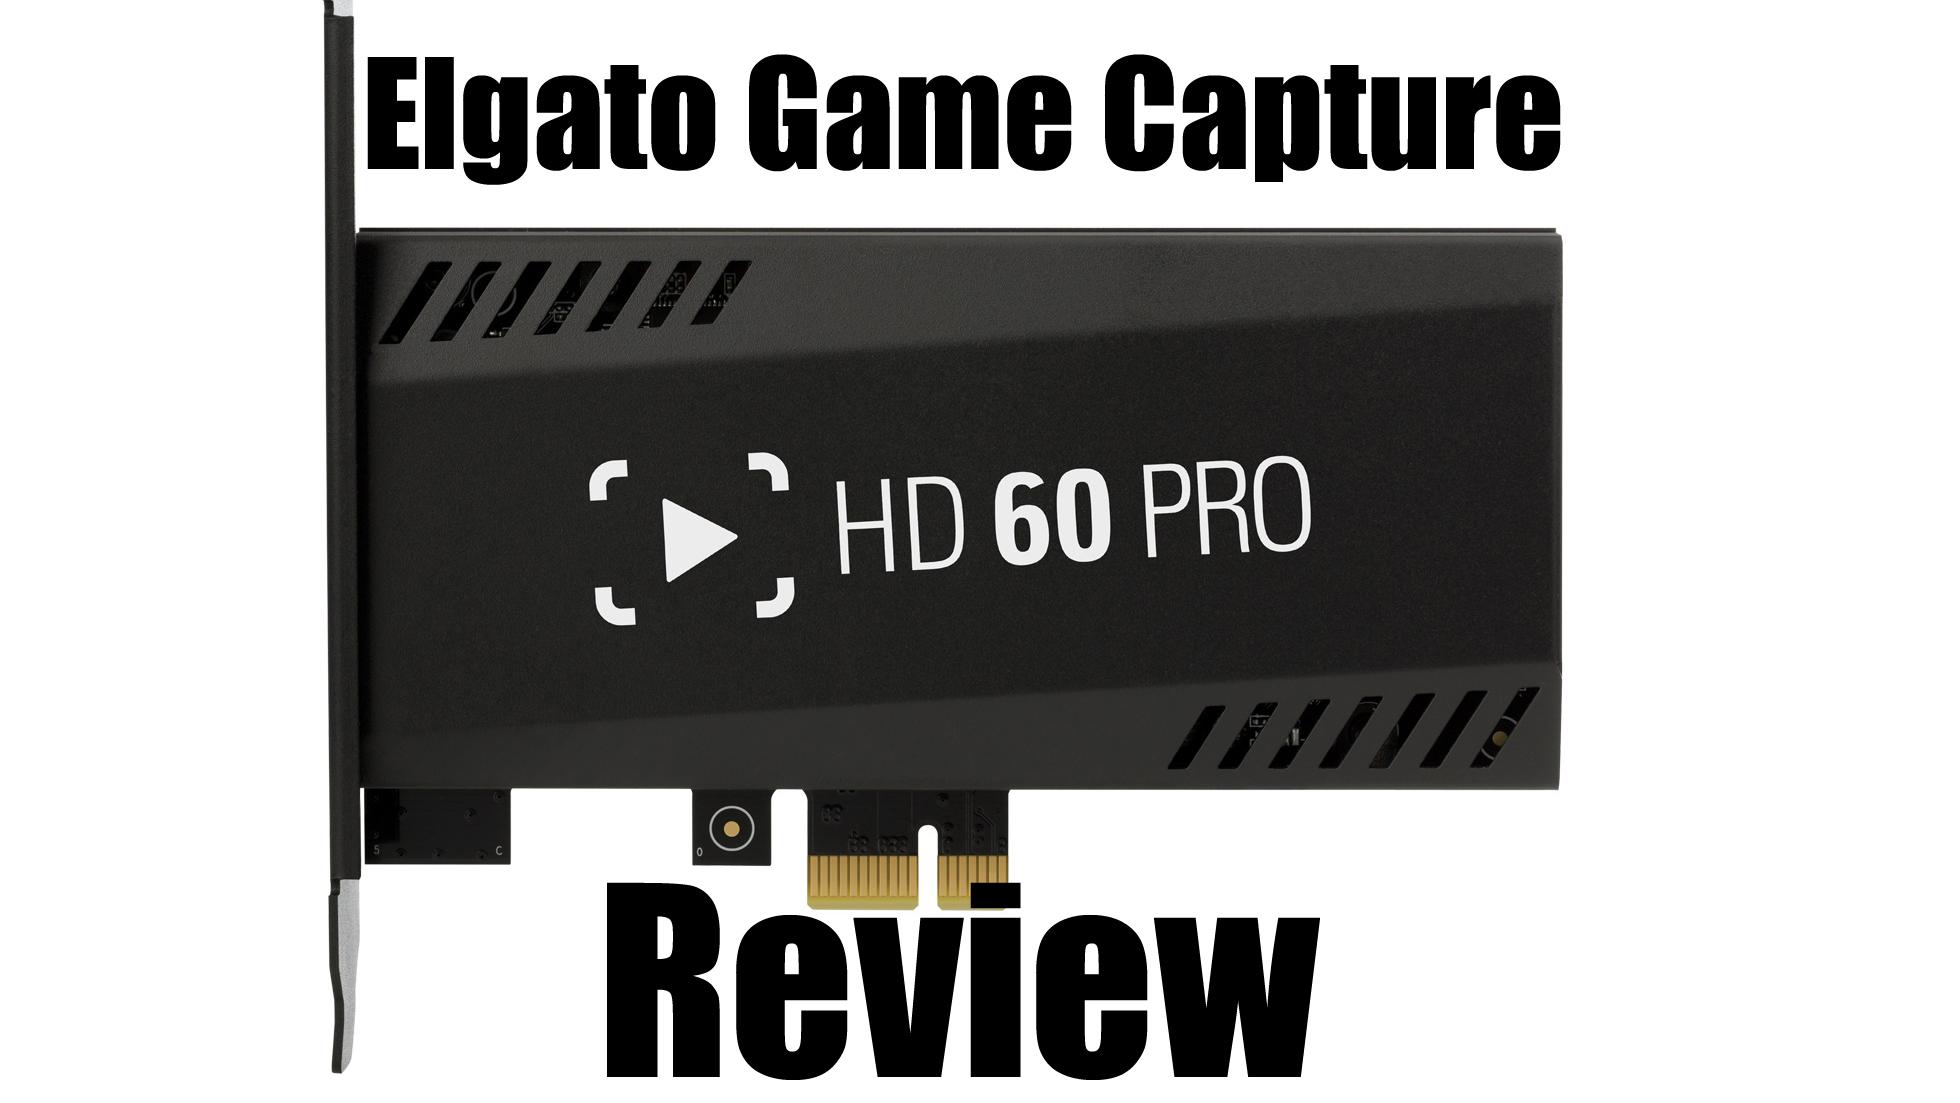 Elgato Game Capture Windows 7 Download